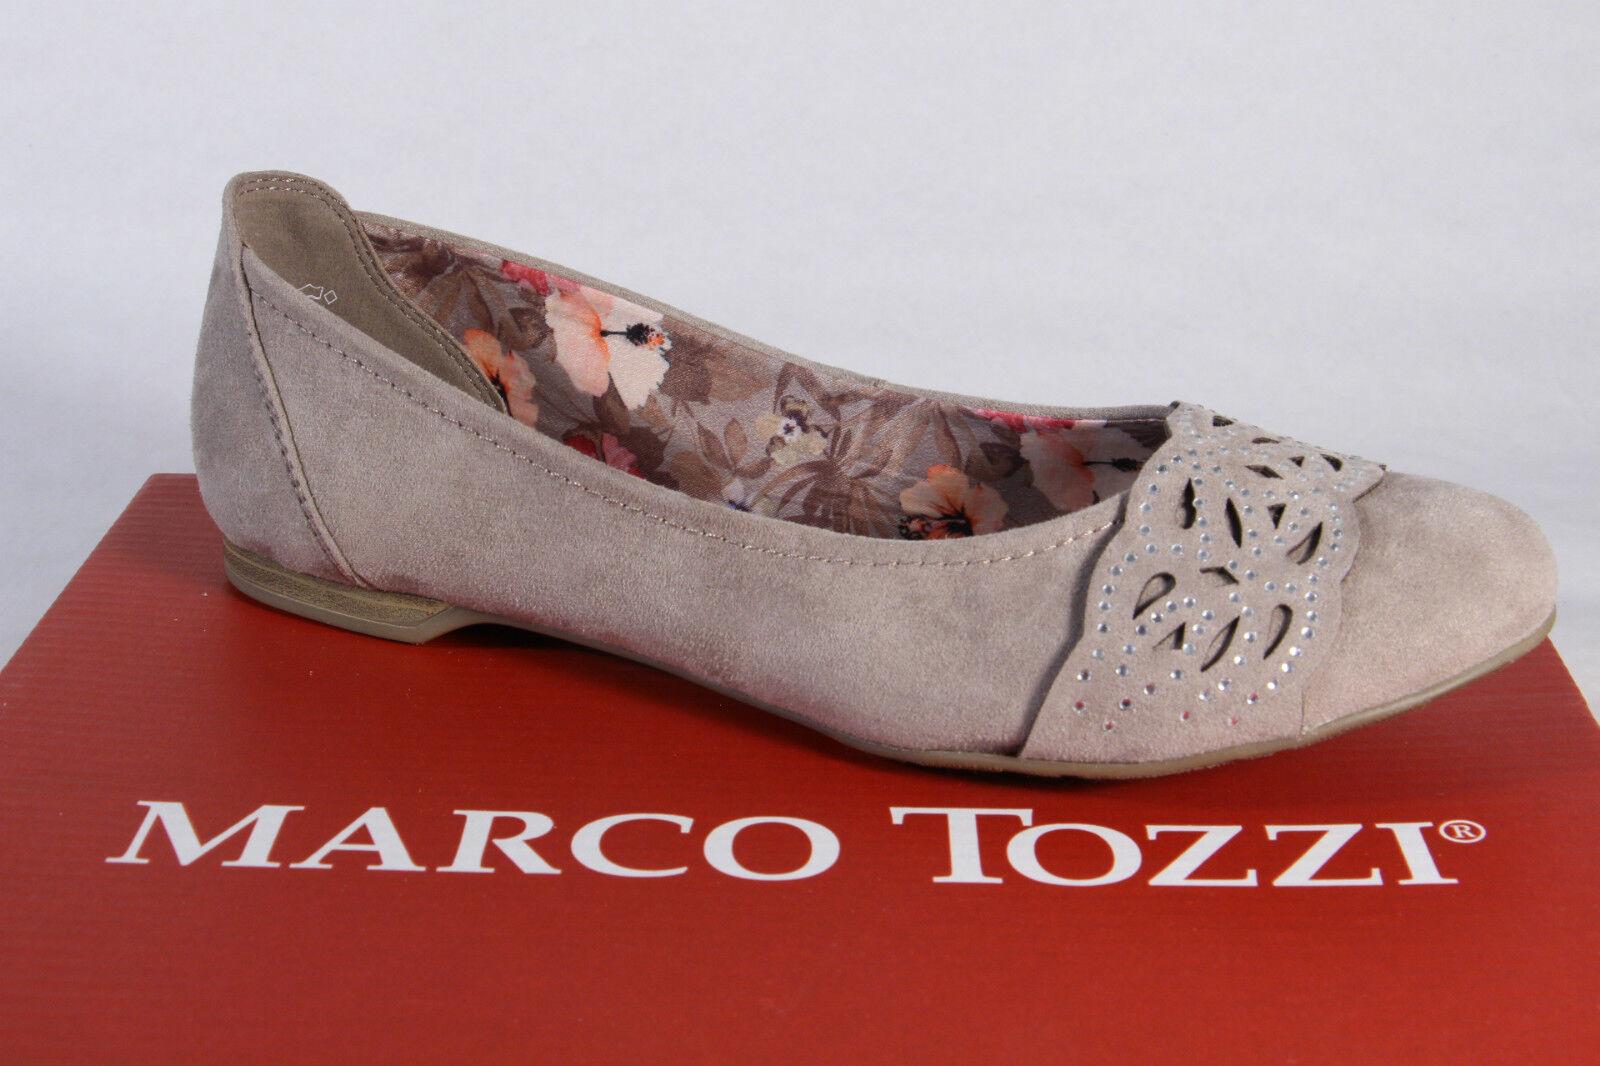 Marco Tozzi Ballerine Mocassins Chaussures Basses Femme Escarpins Beige 42405